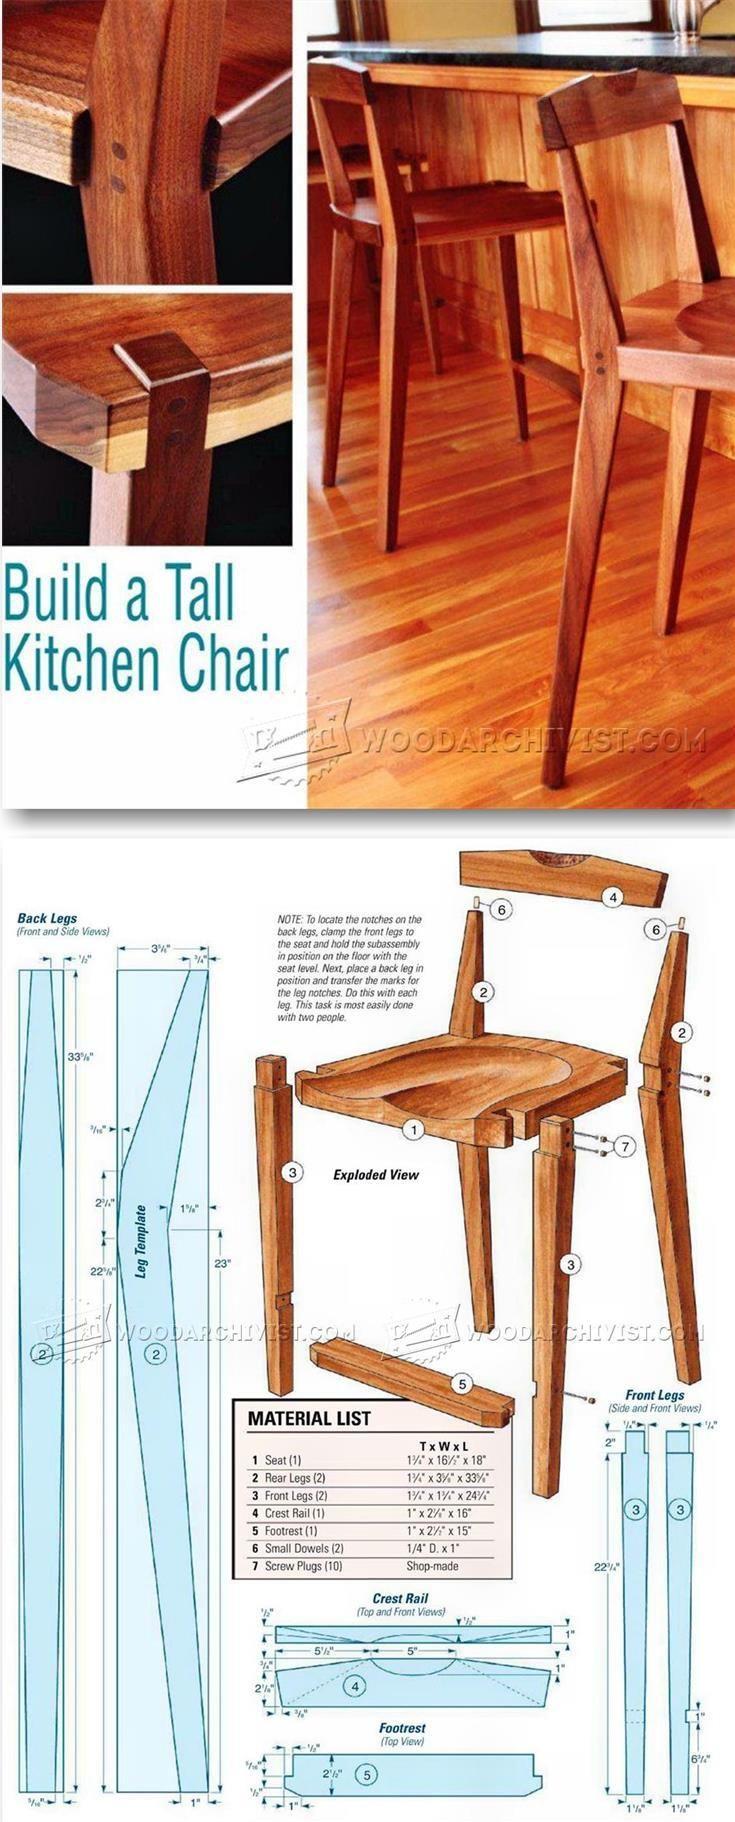 kitchen chairs kitchen wooden chairs Kitchen Chair Plans Furniture Plans and Projects WoodArchivist com